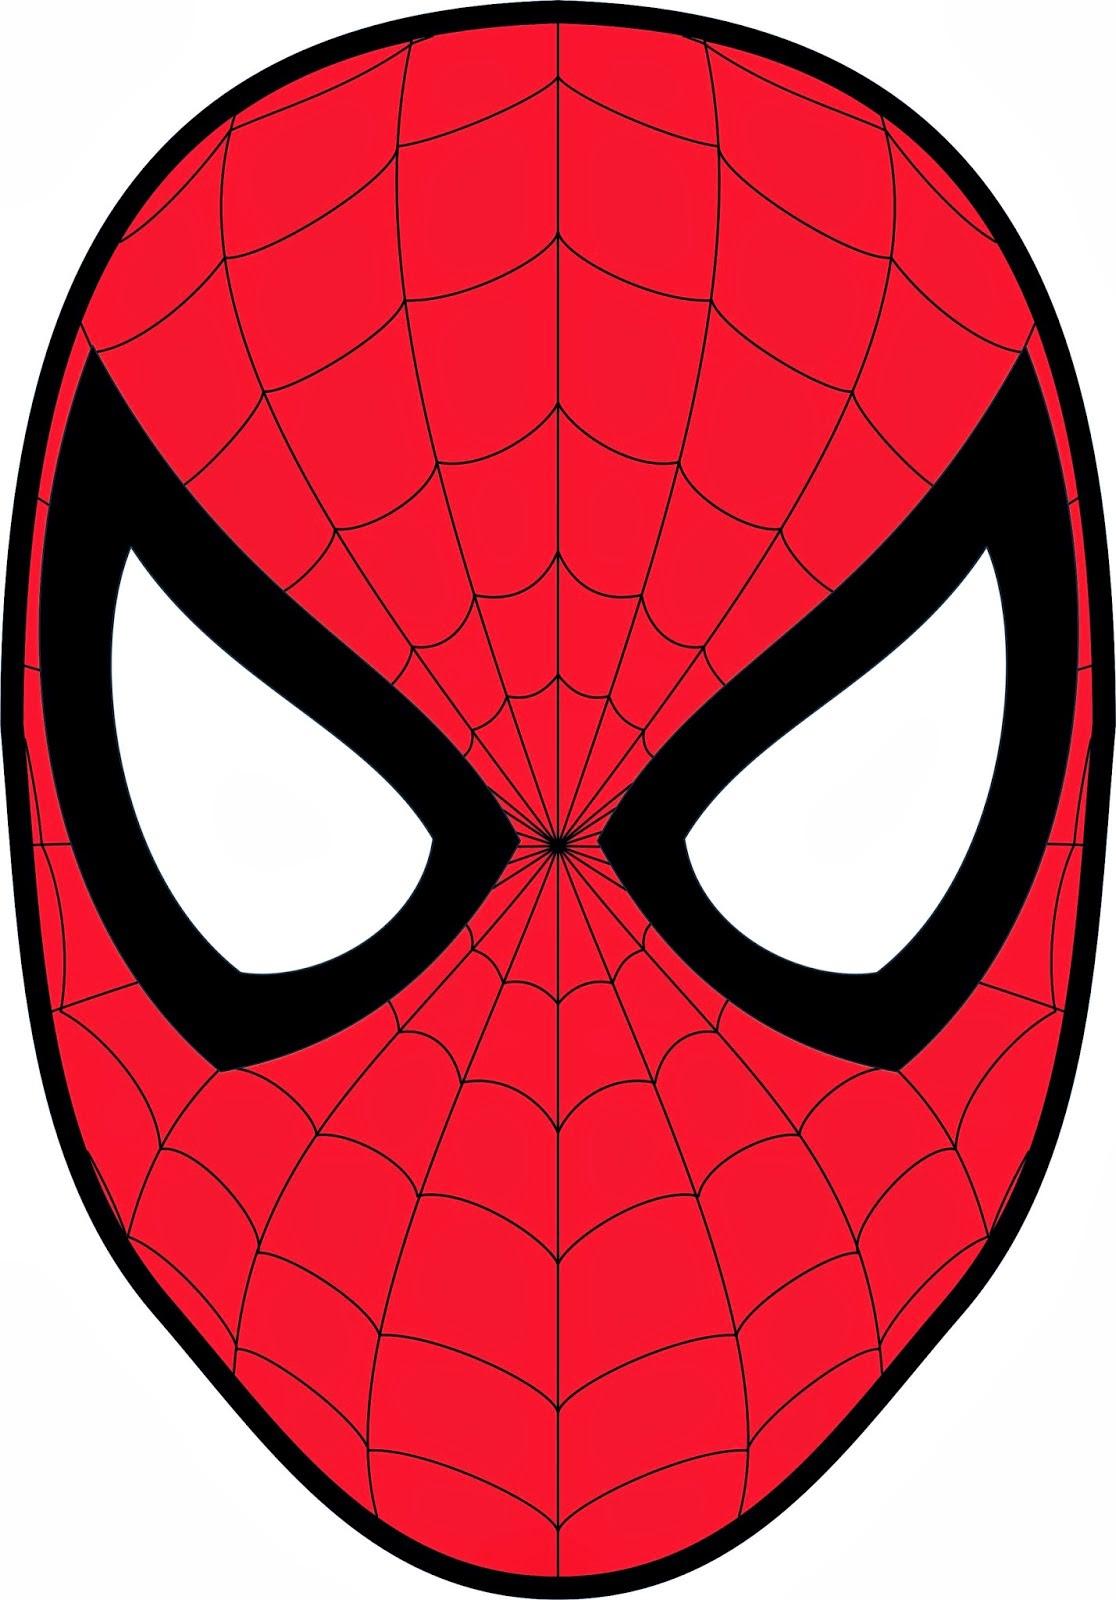 Spiderman: Free Printable Kit. - Oh My Fiesta! For Geeks - Free Printable Spiderman Pictures